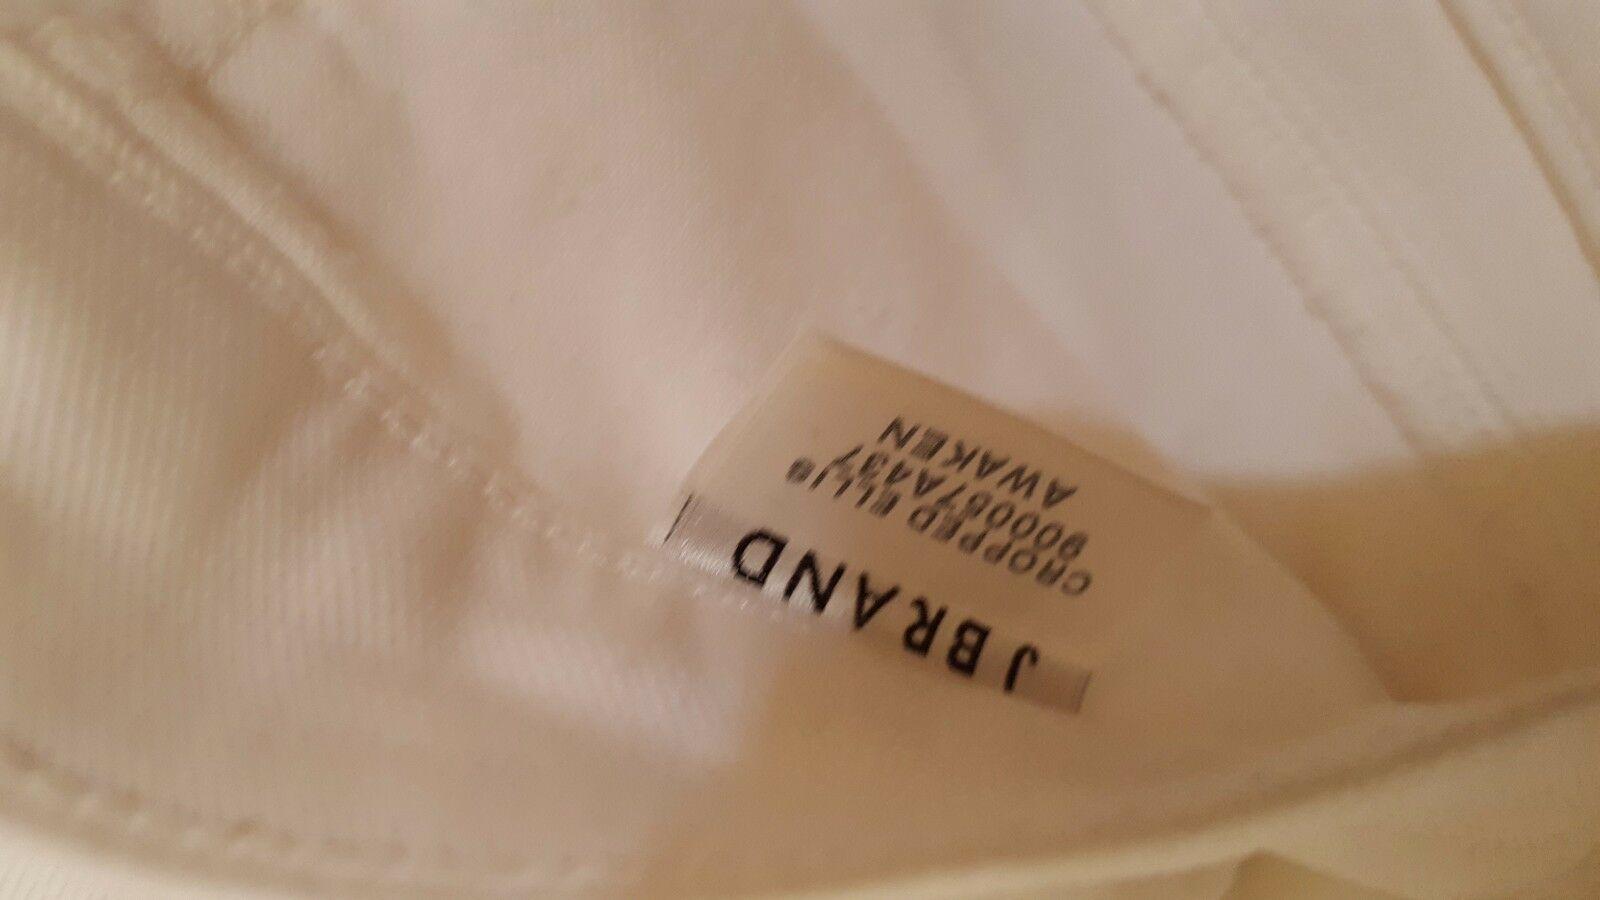 J Brand Jeans Women's Cropped  White Jeans sz 25 Denim  NICE!! #333 image 4